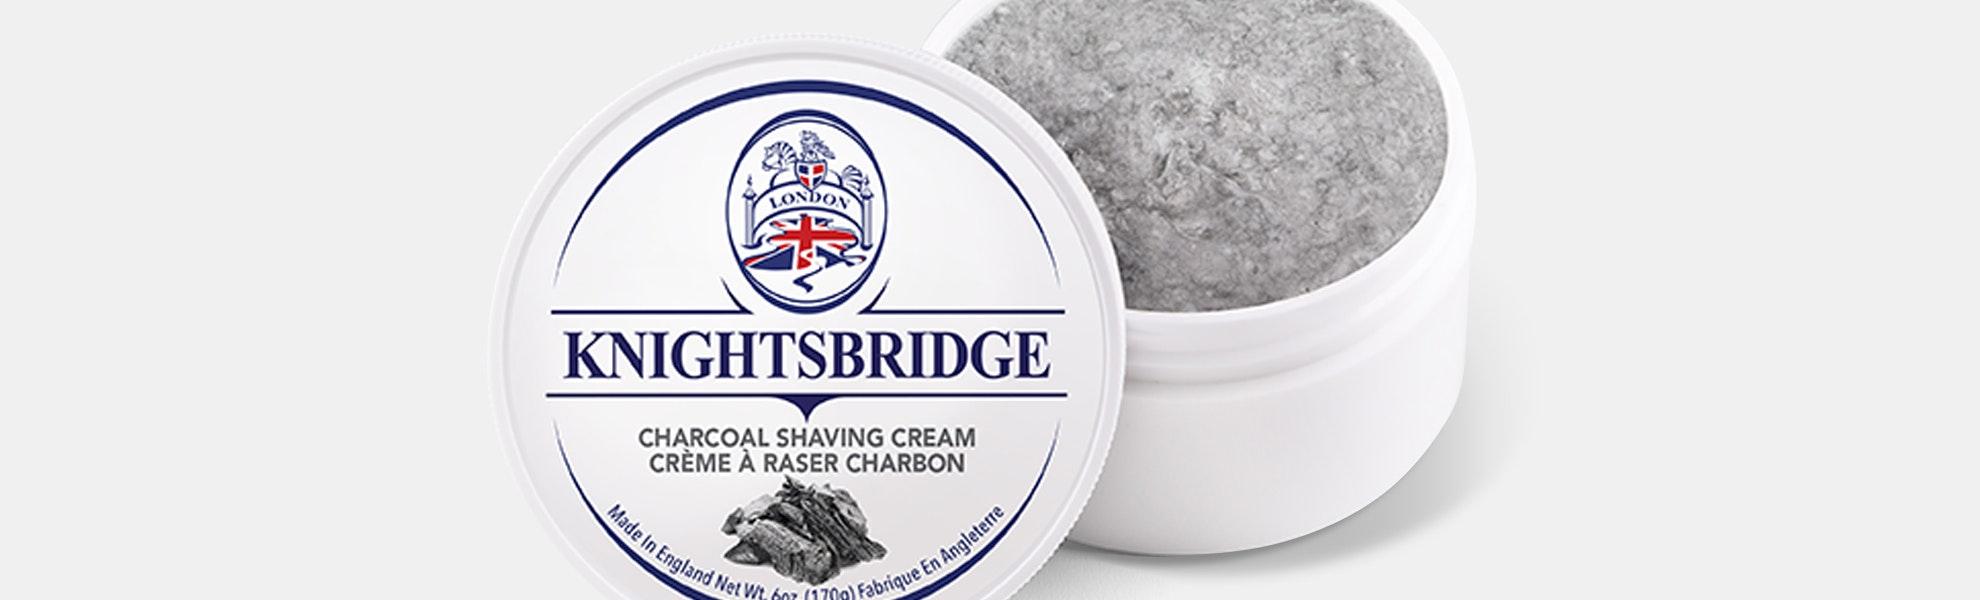 Knightsbridge Shaving Cream – Massdrop Exclusive